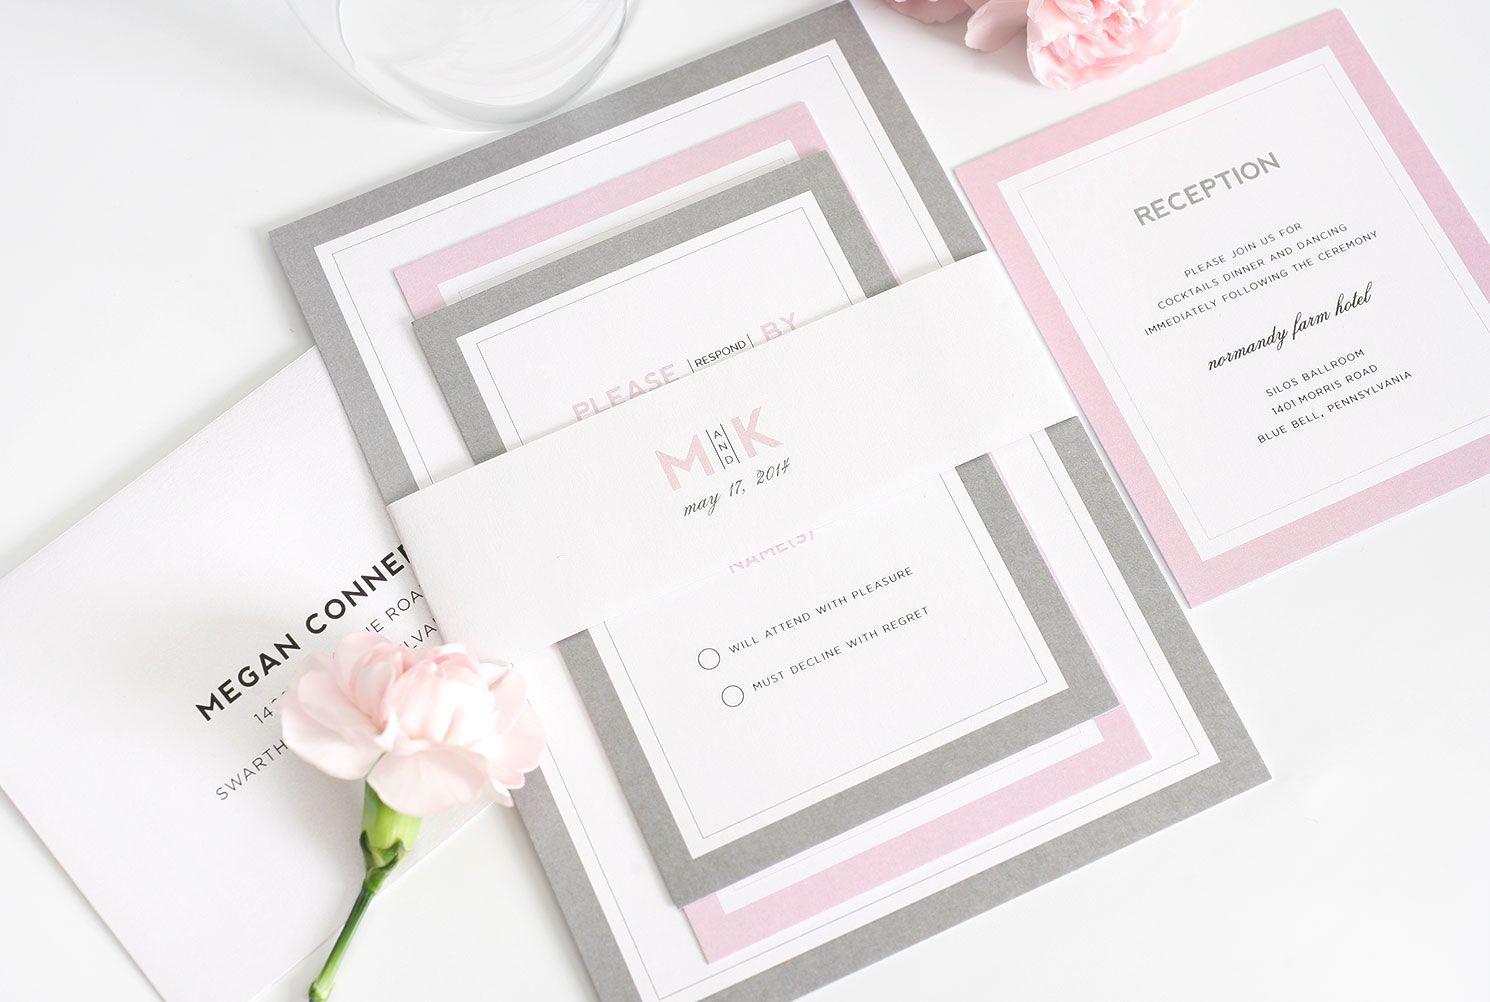 wedding invitations | clothes | Pinterest | Weddings